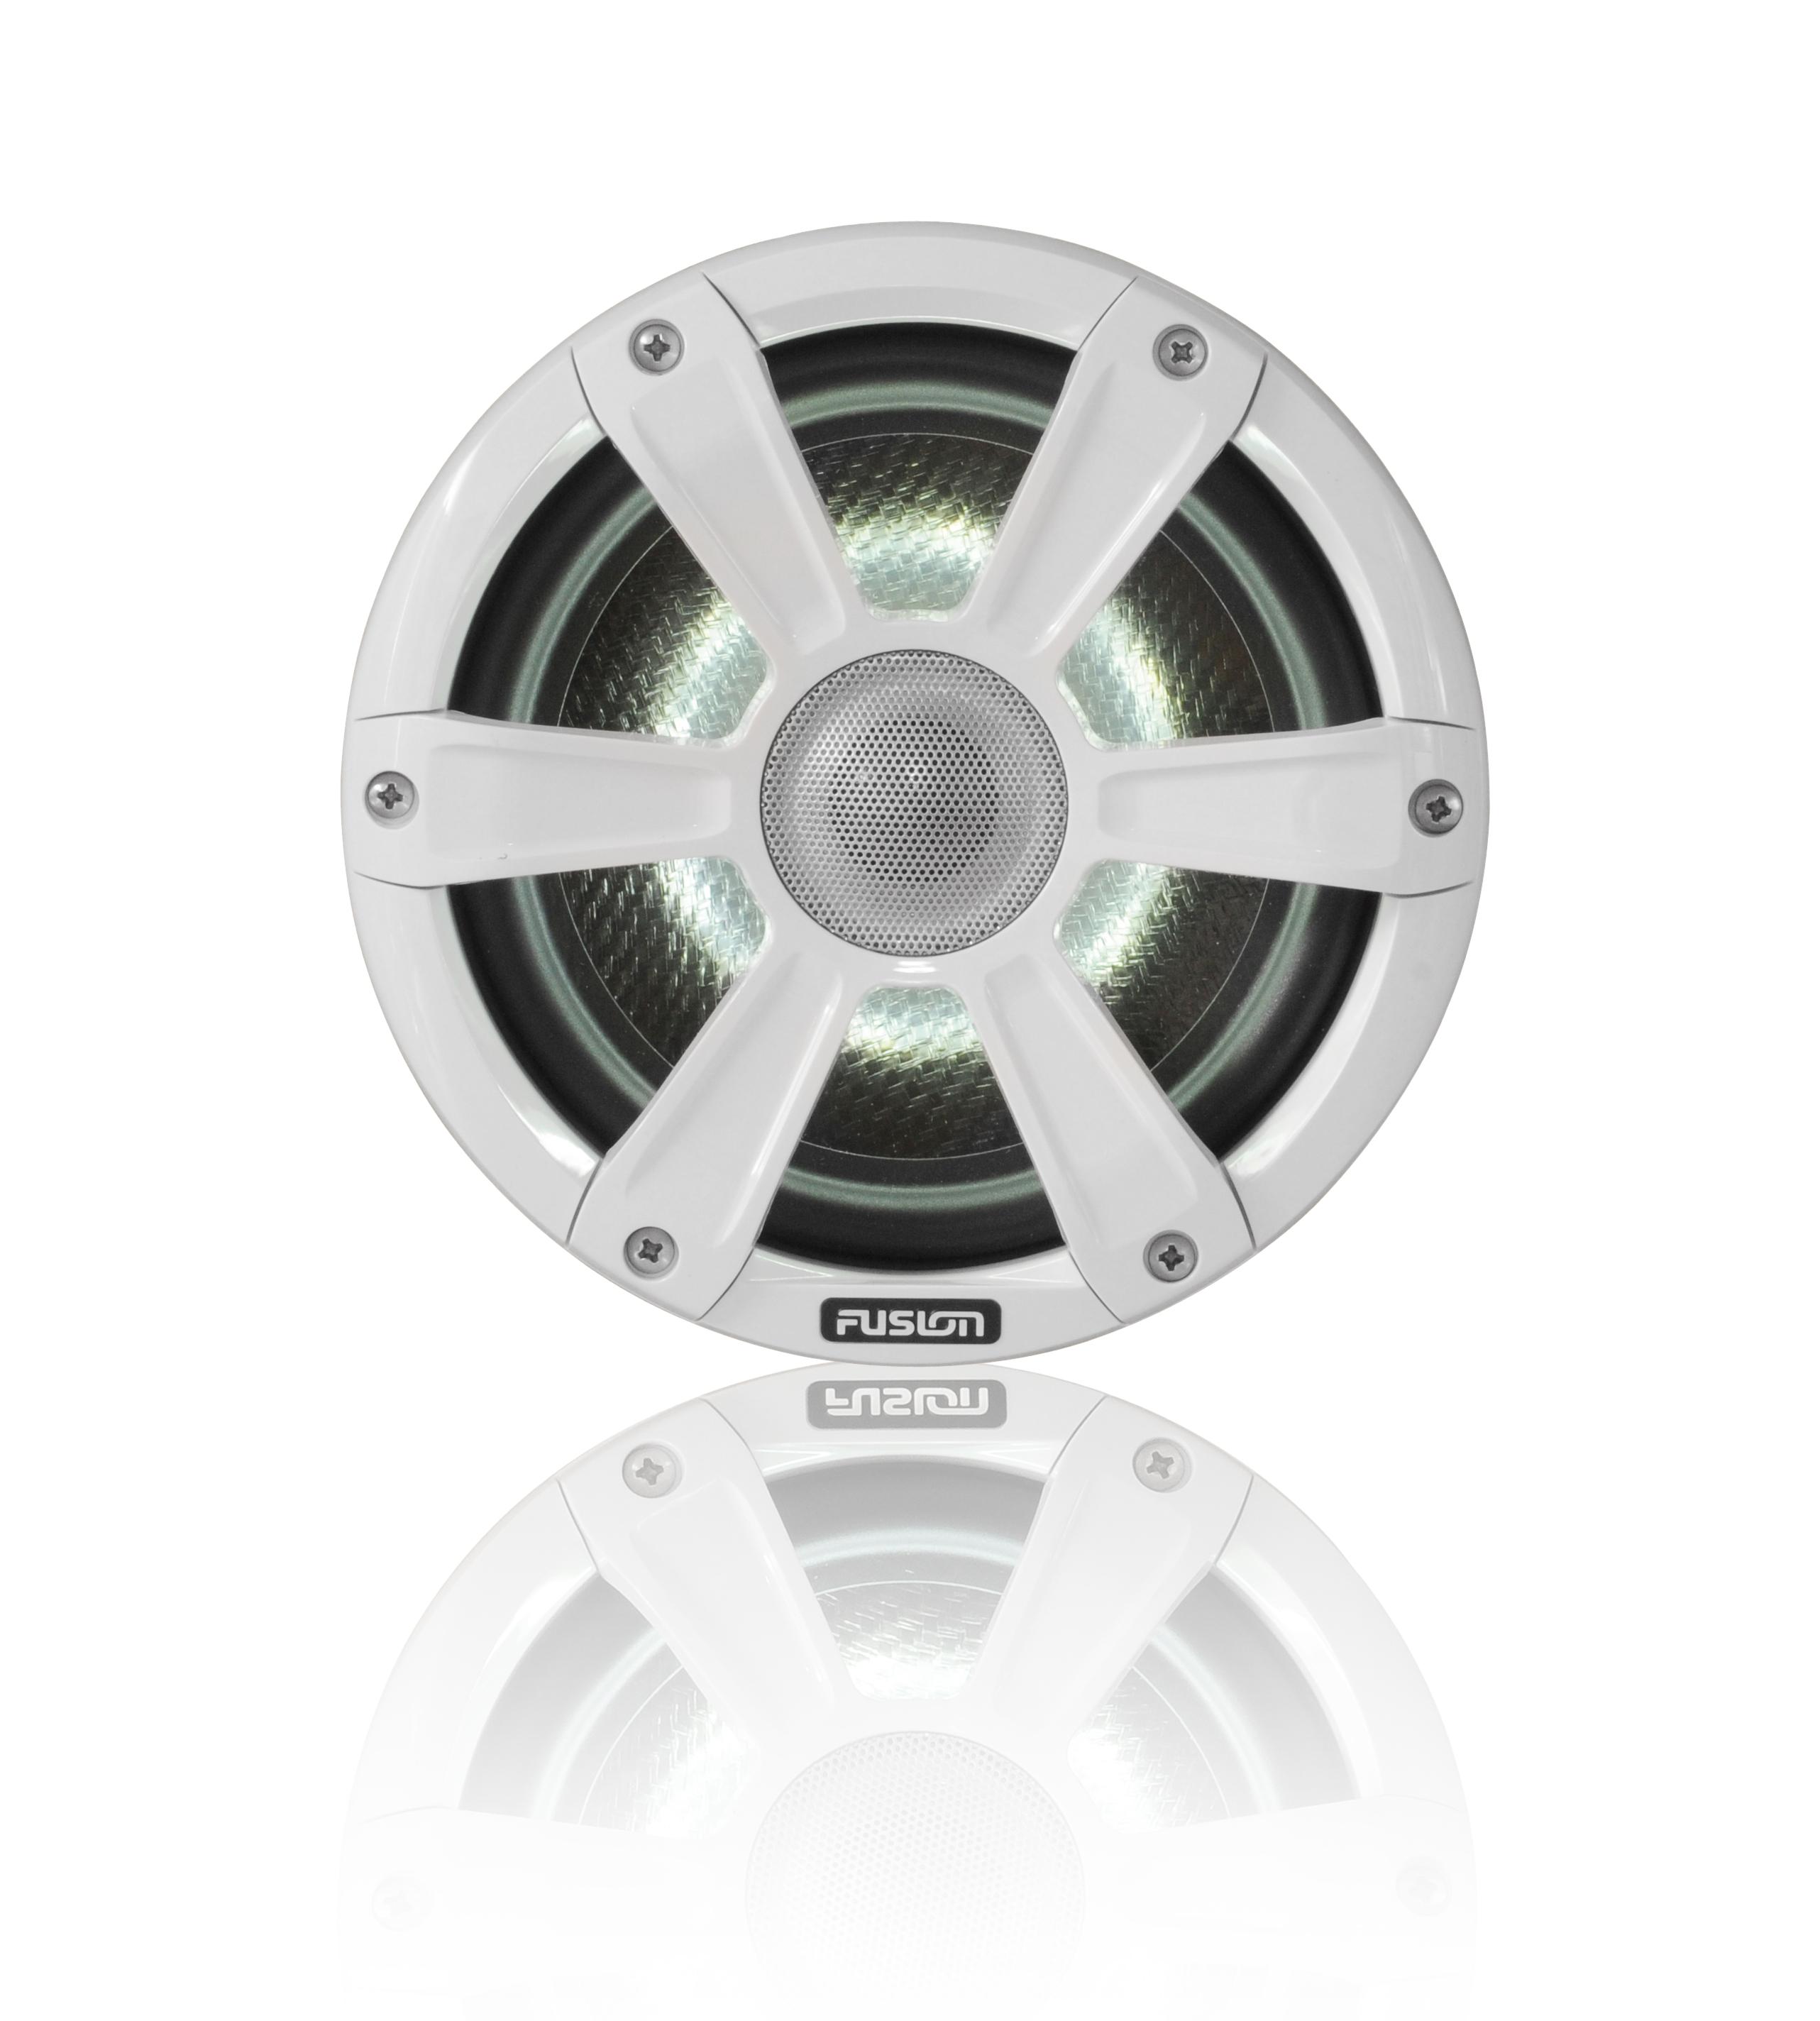 Fusion SG-CL77SPW 7.7 Speaker Signature Sport Grille White - # 010-01428-12